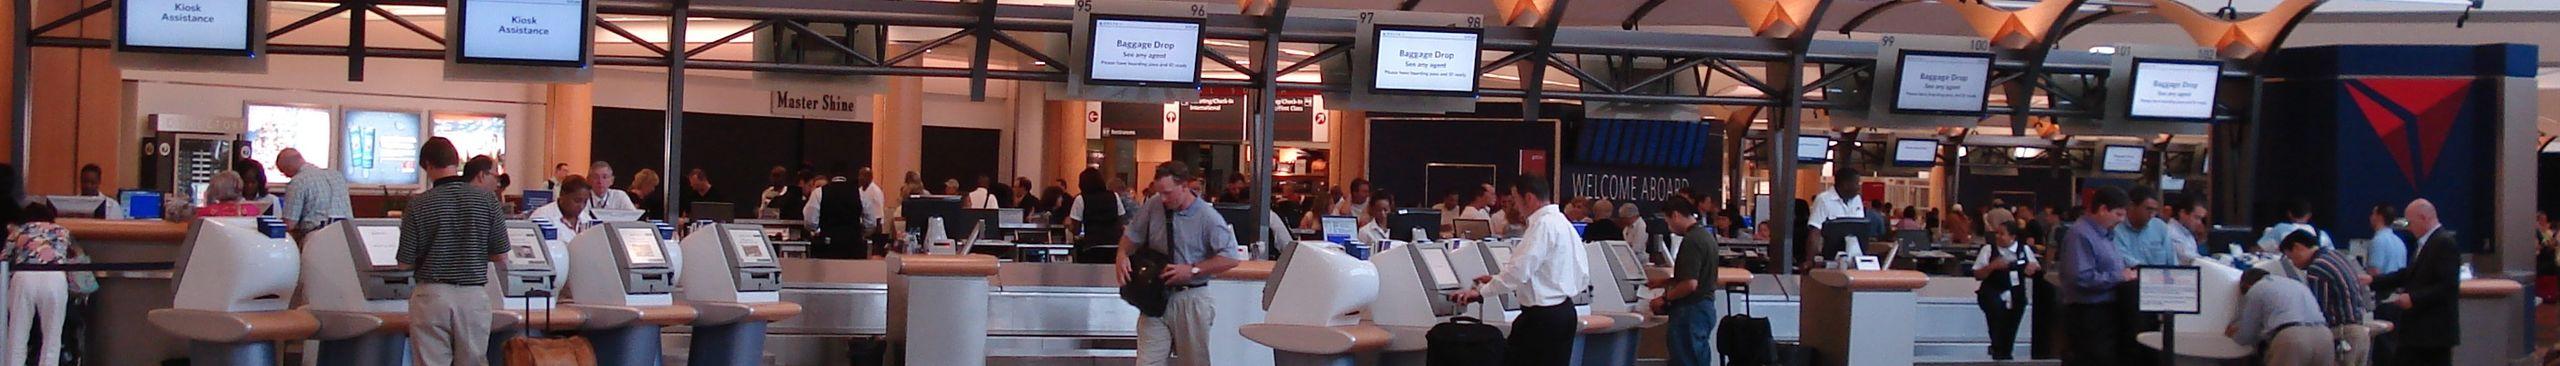 hartsfield u2013jackson atlanta international airport u2013 travel guide at